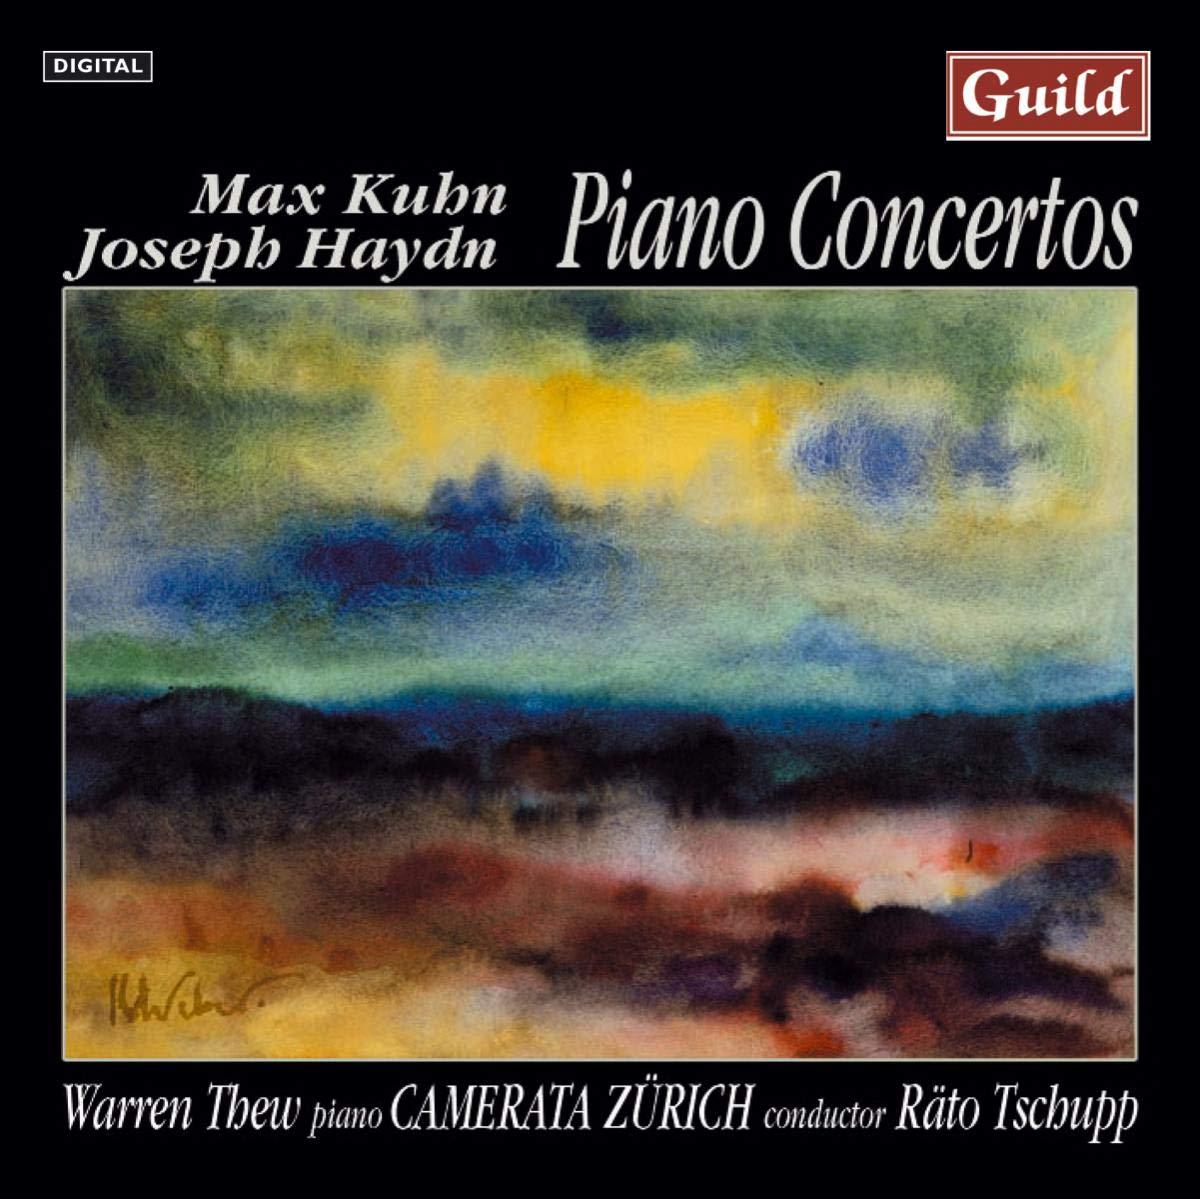 Amazon.com: Piano Concerto in F / Concierto de Tenerife: Music